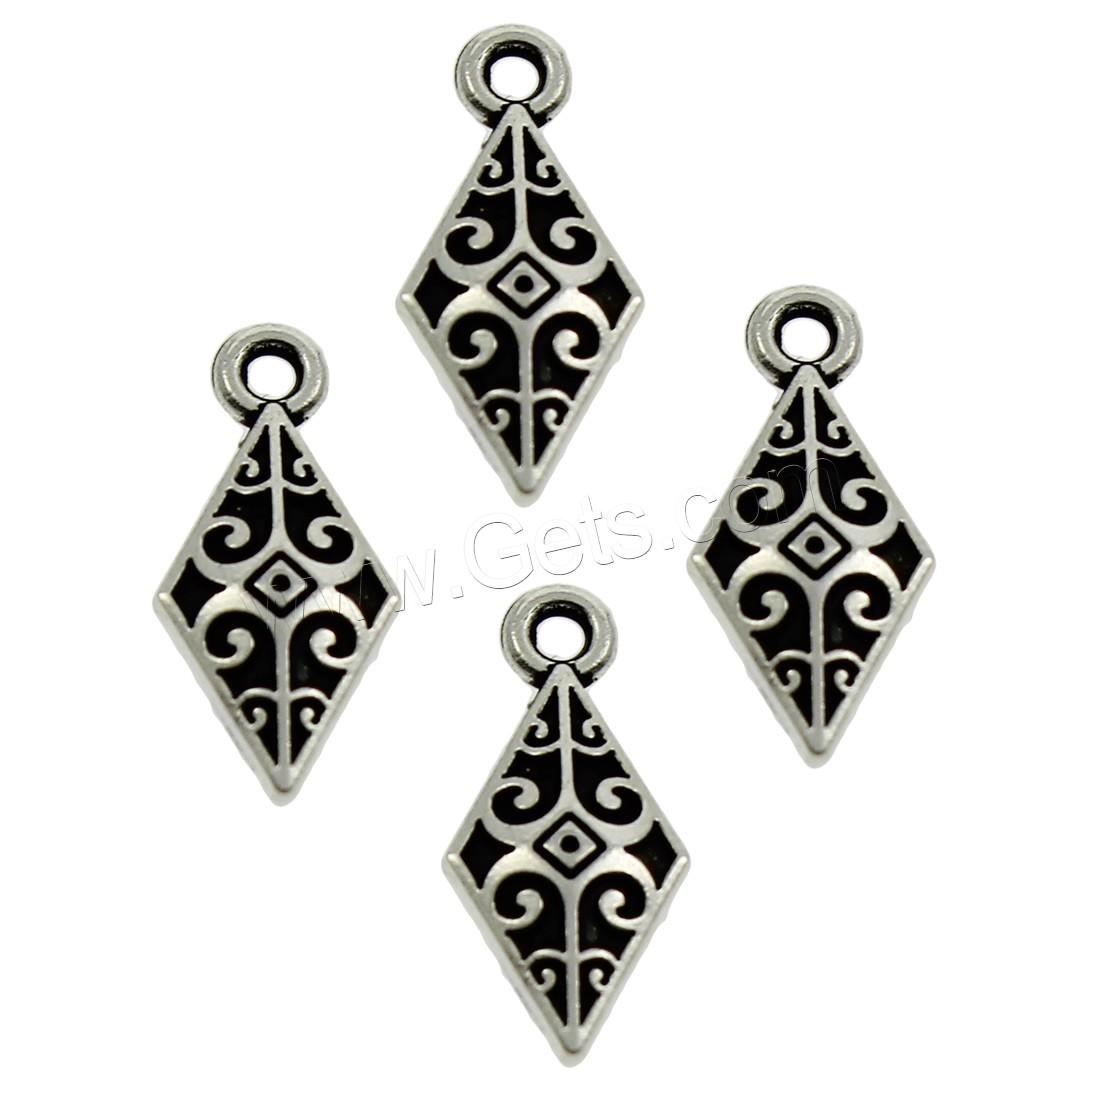 Zinc alloy jewelry pendants antique silver color plated